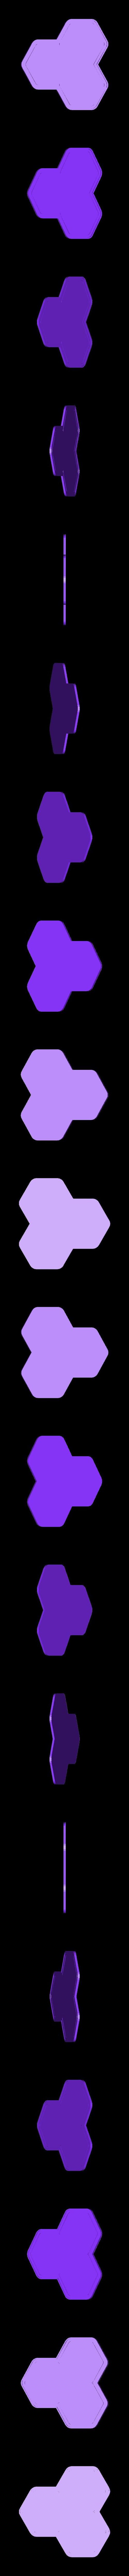 Hex_Planter_Base.stl Download free STL file Simple Hexagon Planter • 3D printing model, DragonflyFabrication